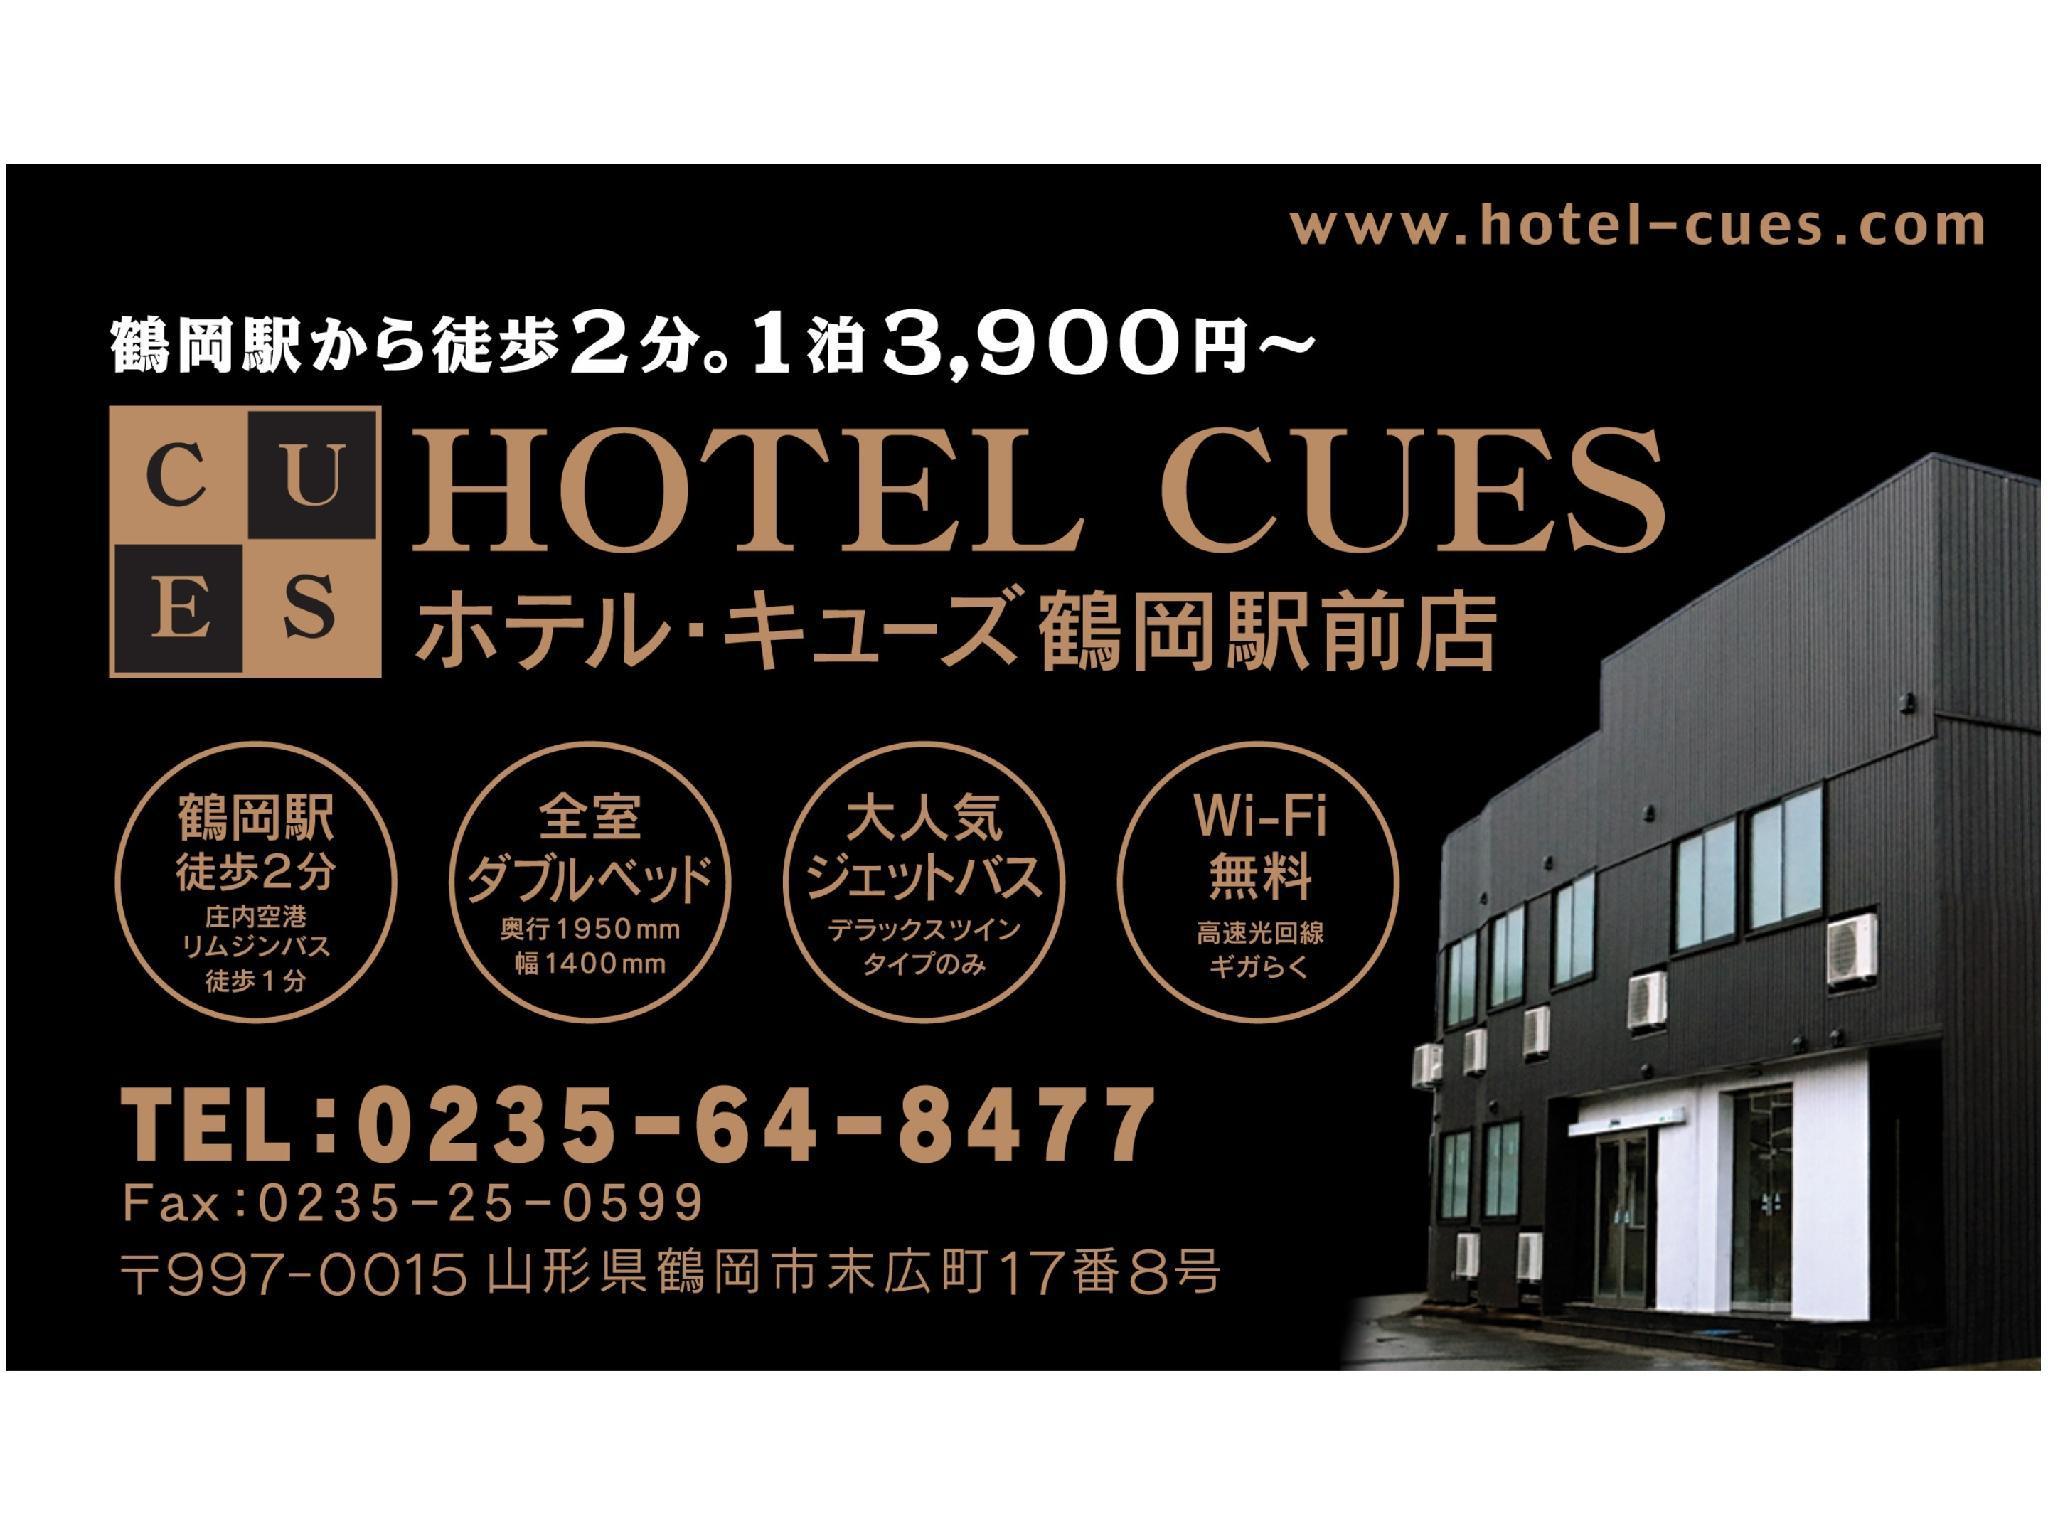 Hotel Cues Tsuruoka Station